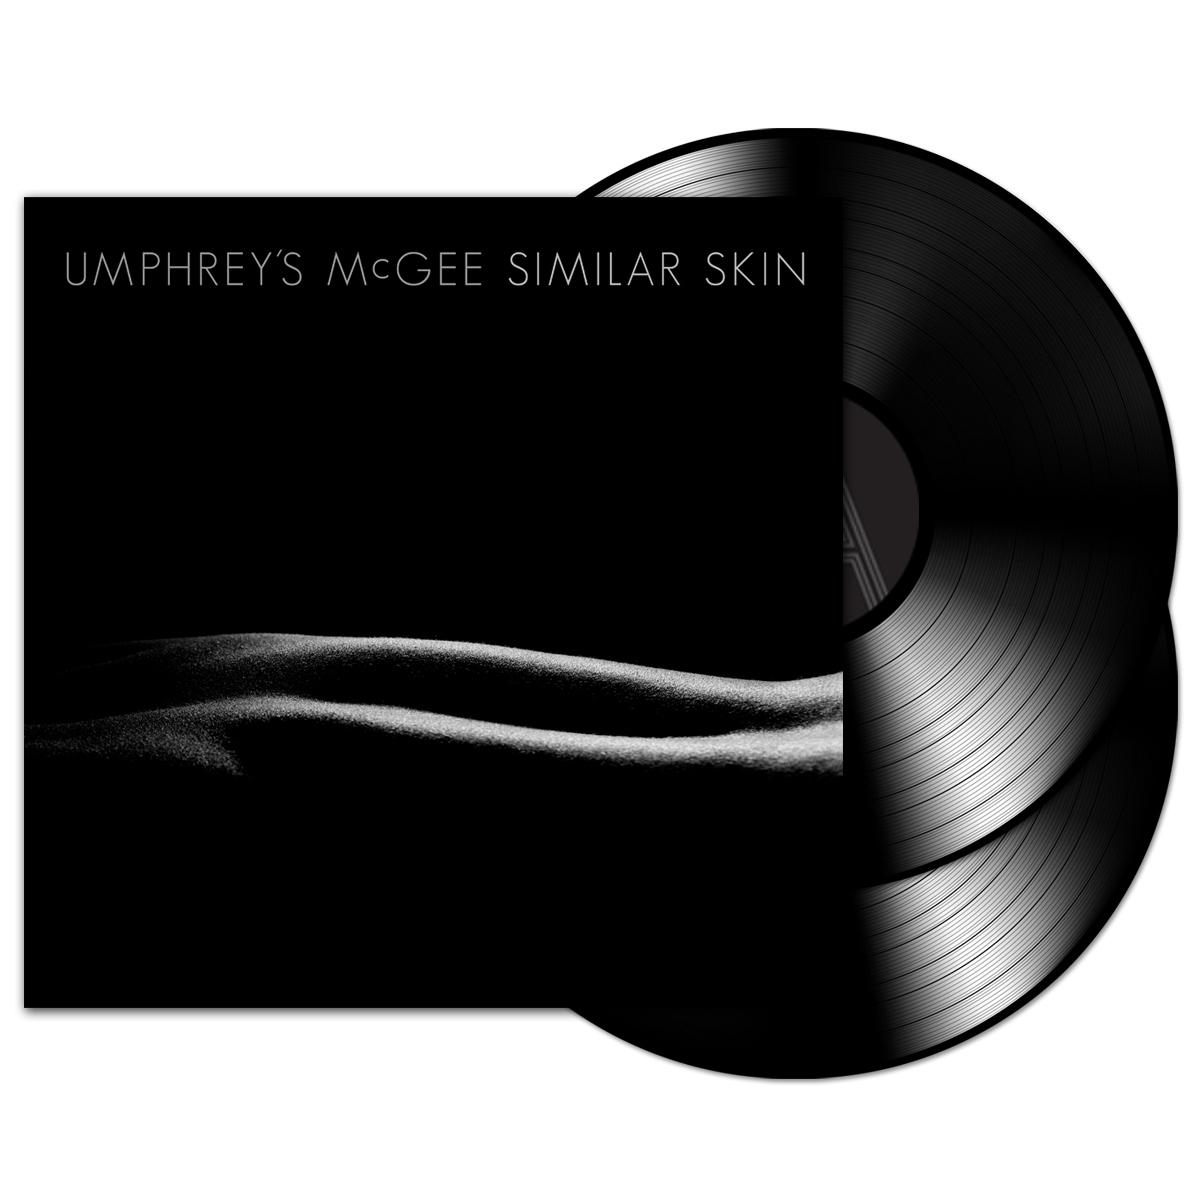 Similar Skin Double LP Vinyl